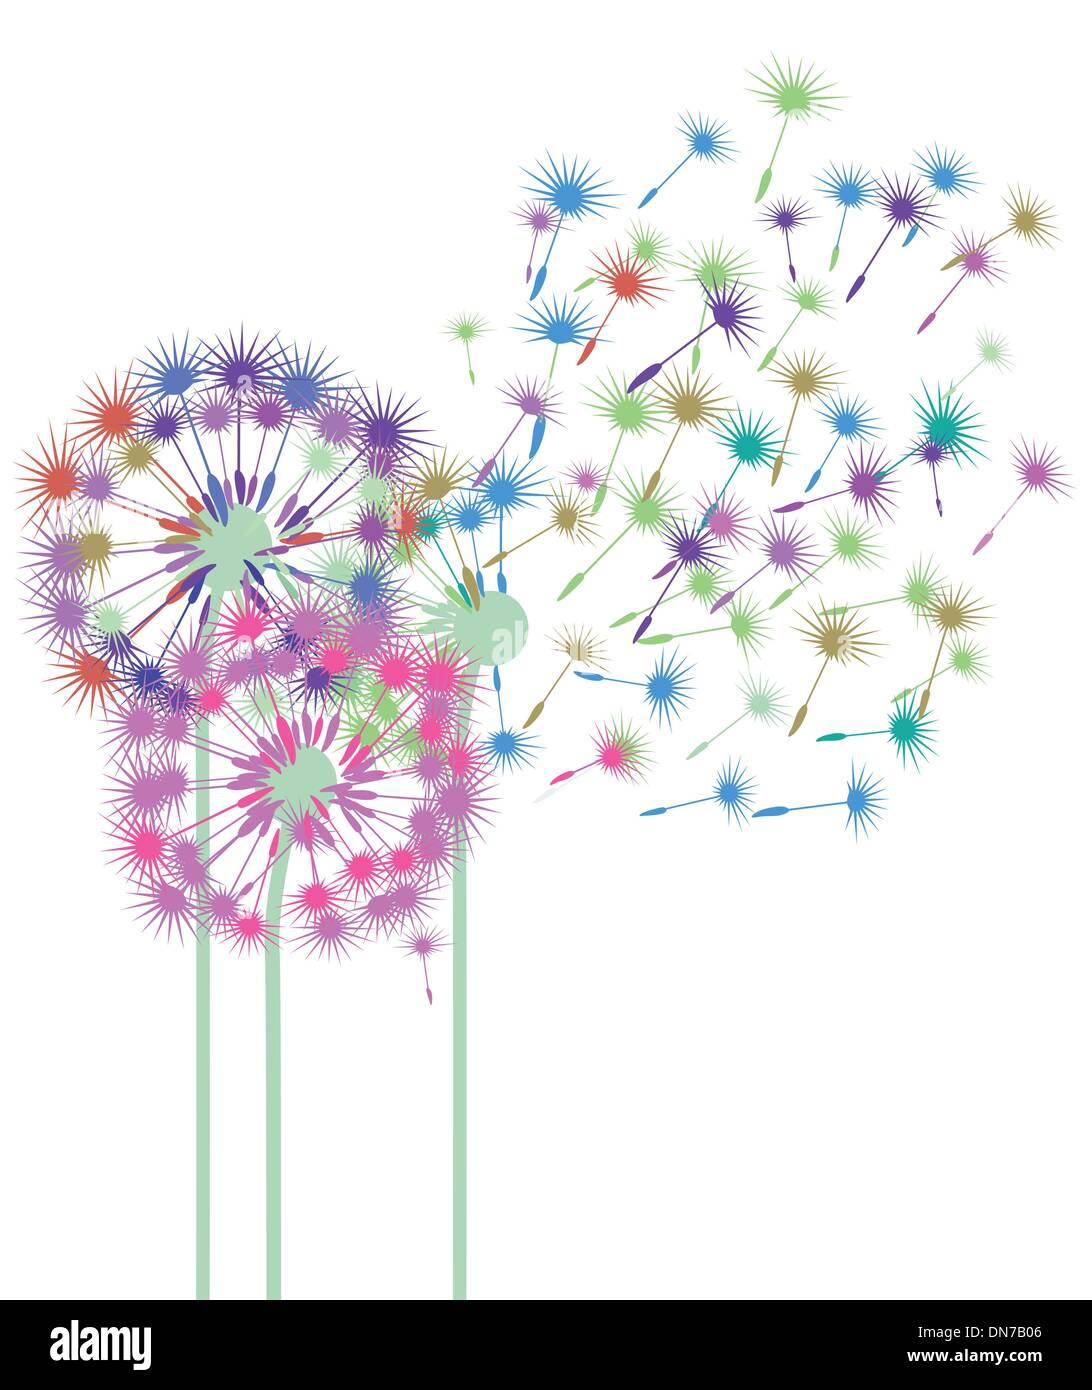 colorful dandelions - Stock Vector